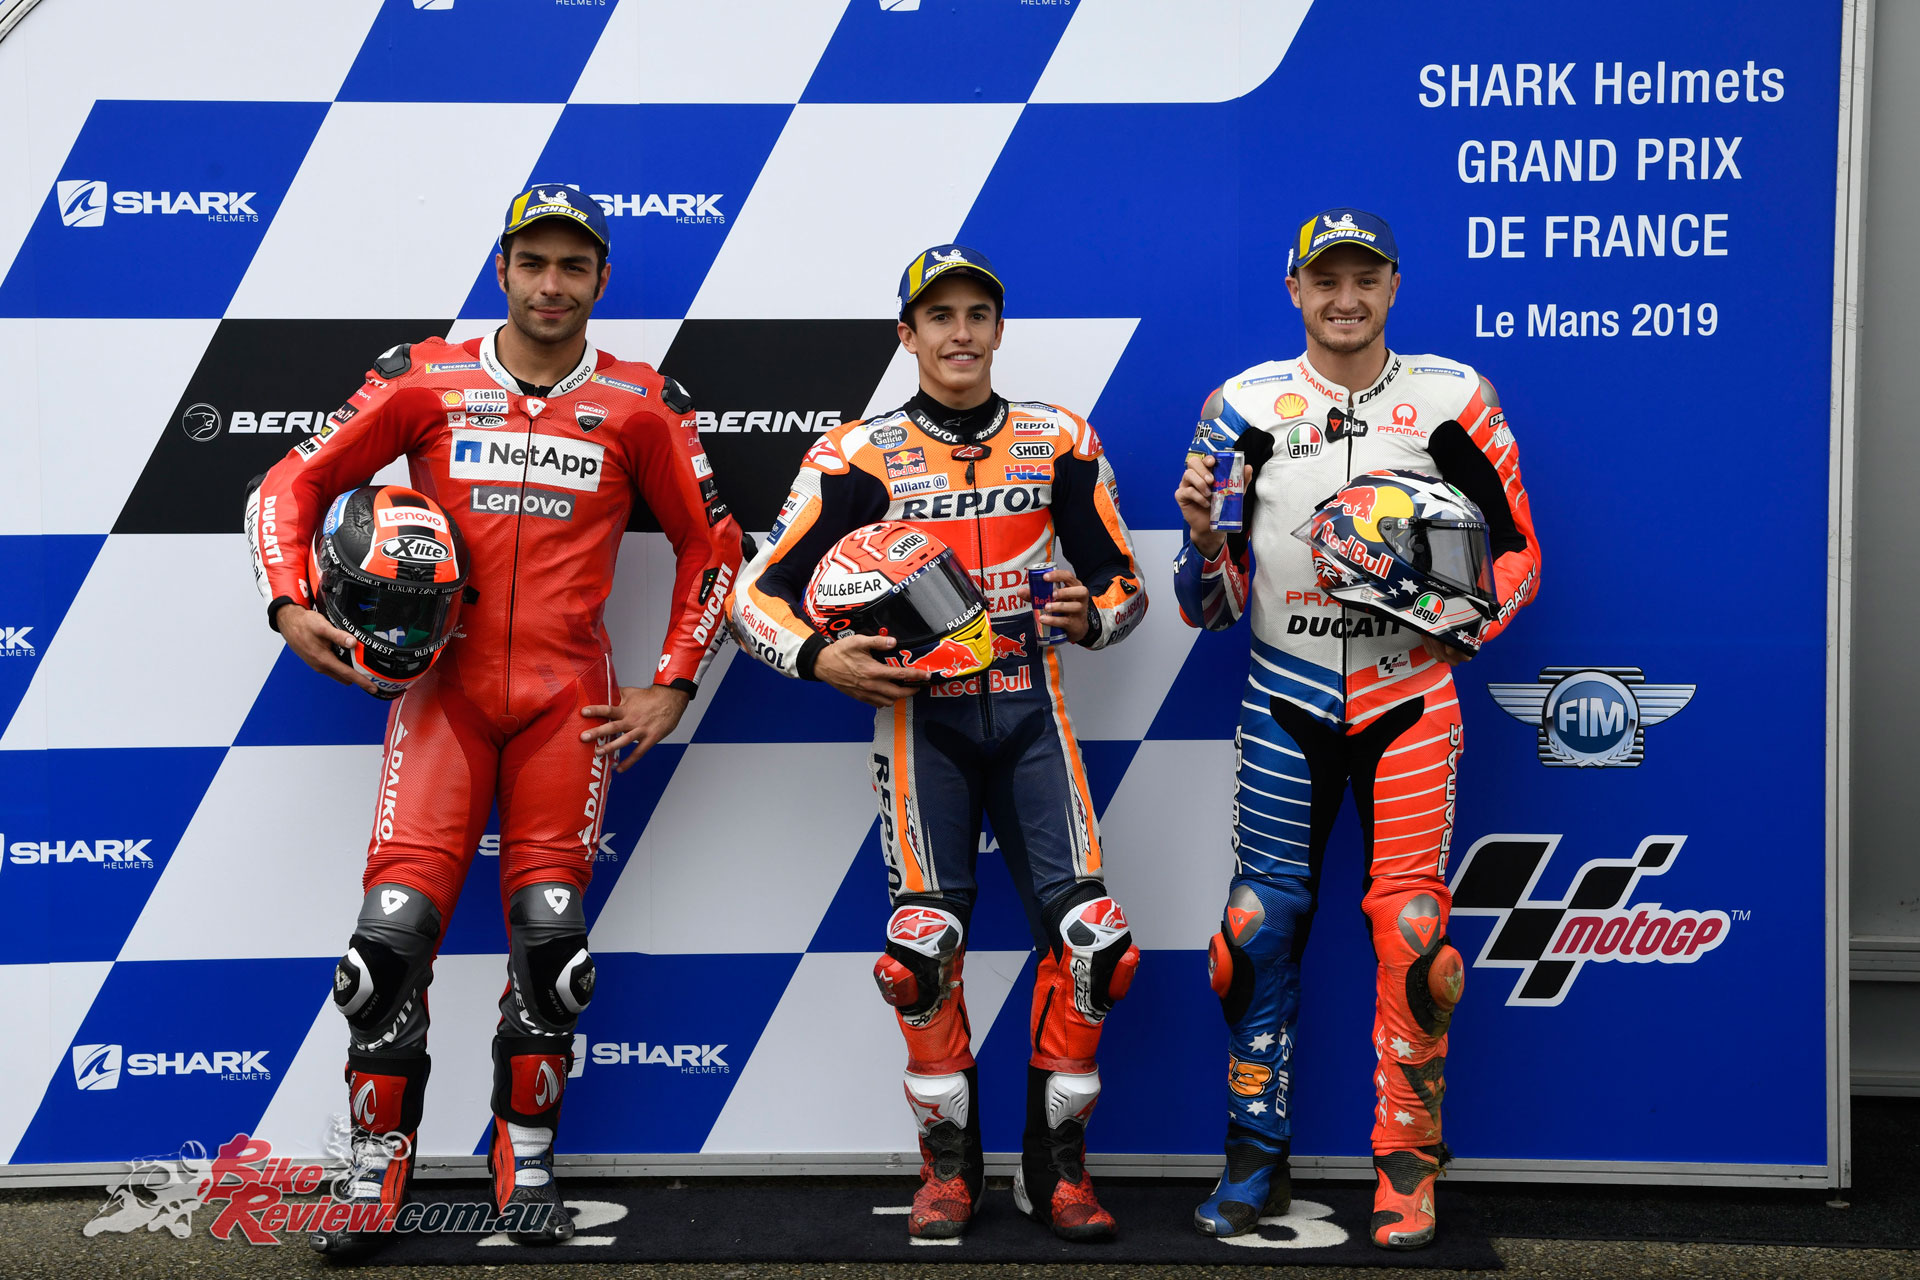 MotoGP Qualifying Top 3 - Le Mans, France, 2019